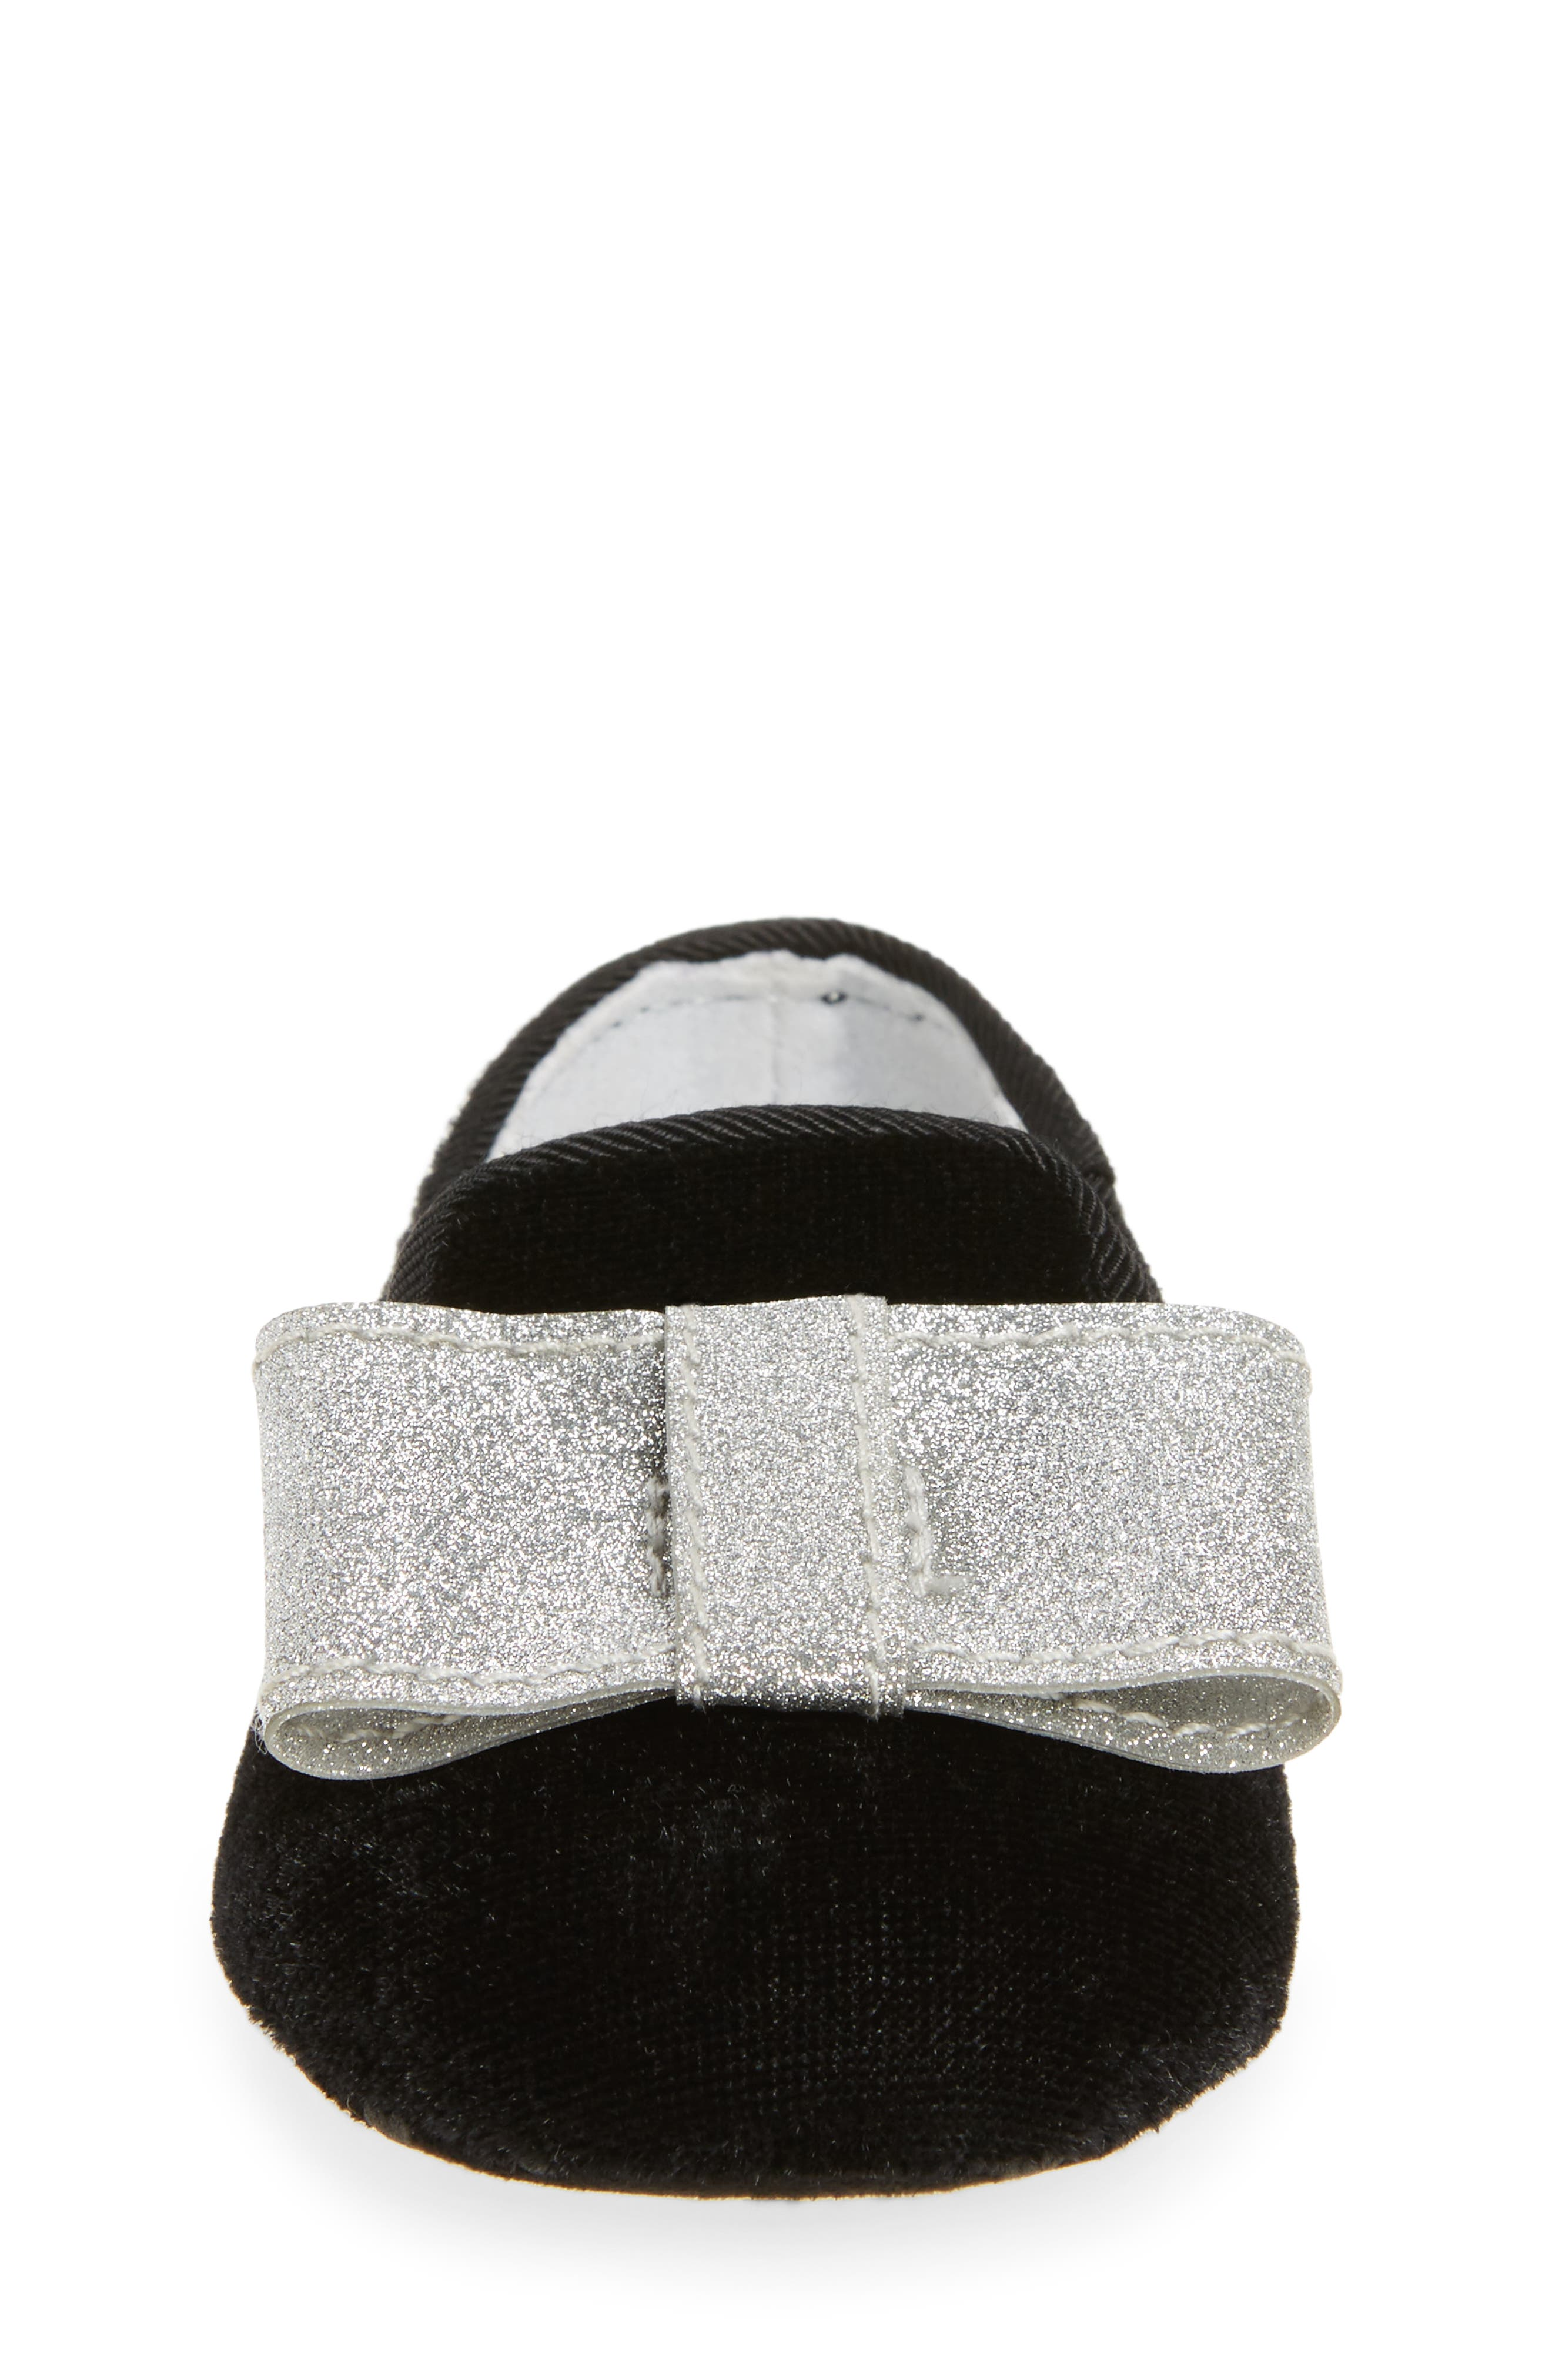 Bow Loafer Crib Shoe,                             Alternate thumbnail 4, color,                             012